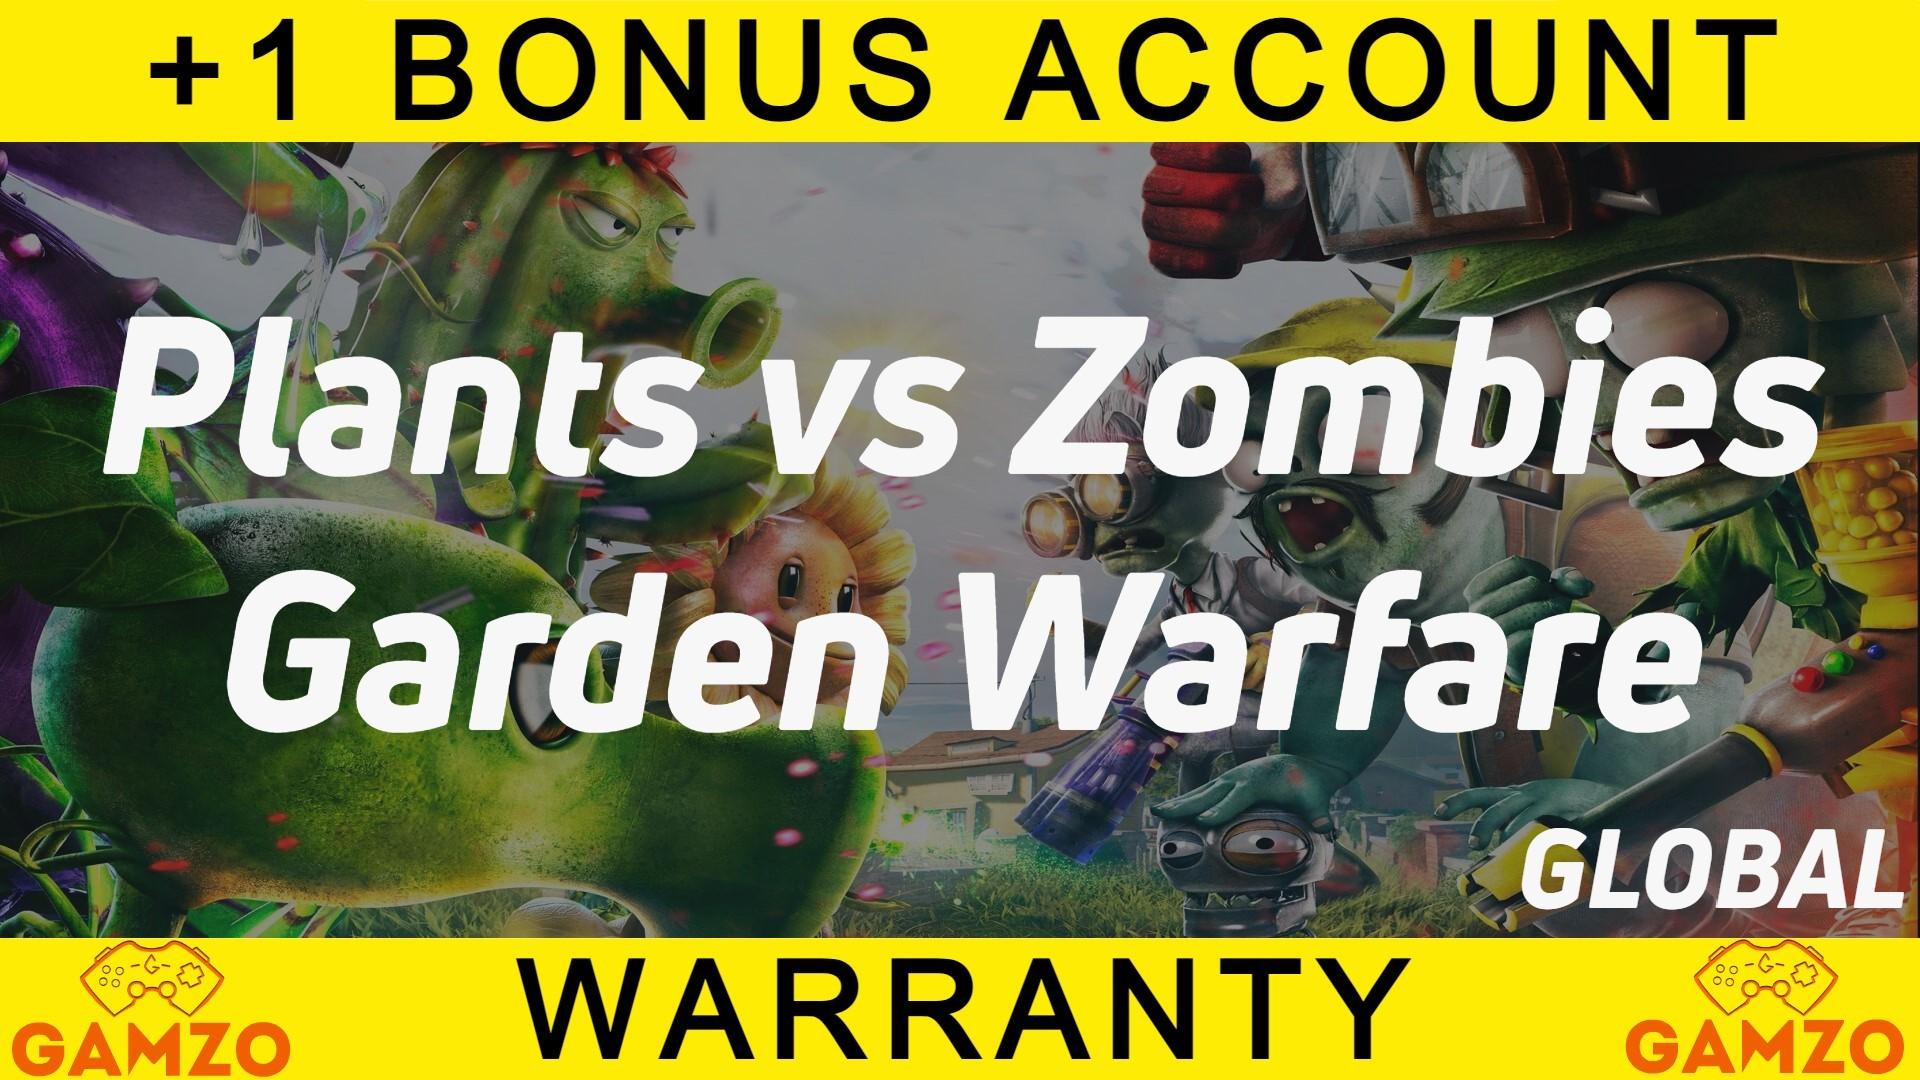 Plants vs. Zombies GW   Гарантия 5 лет   + Подарок